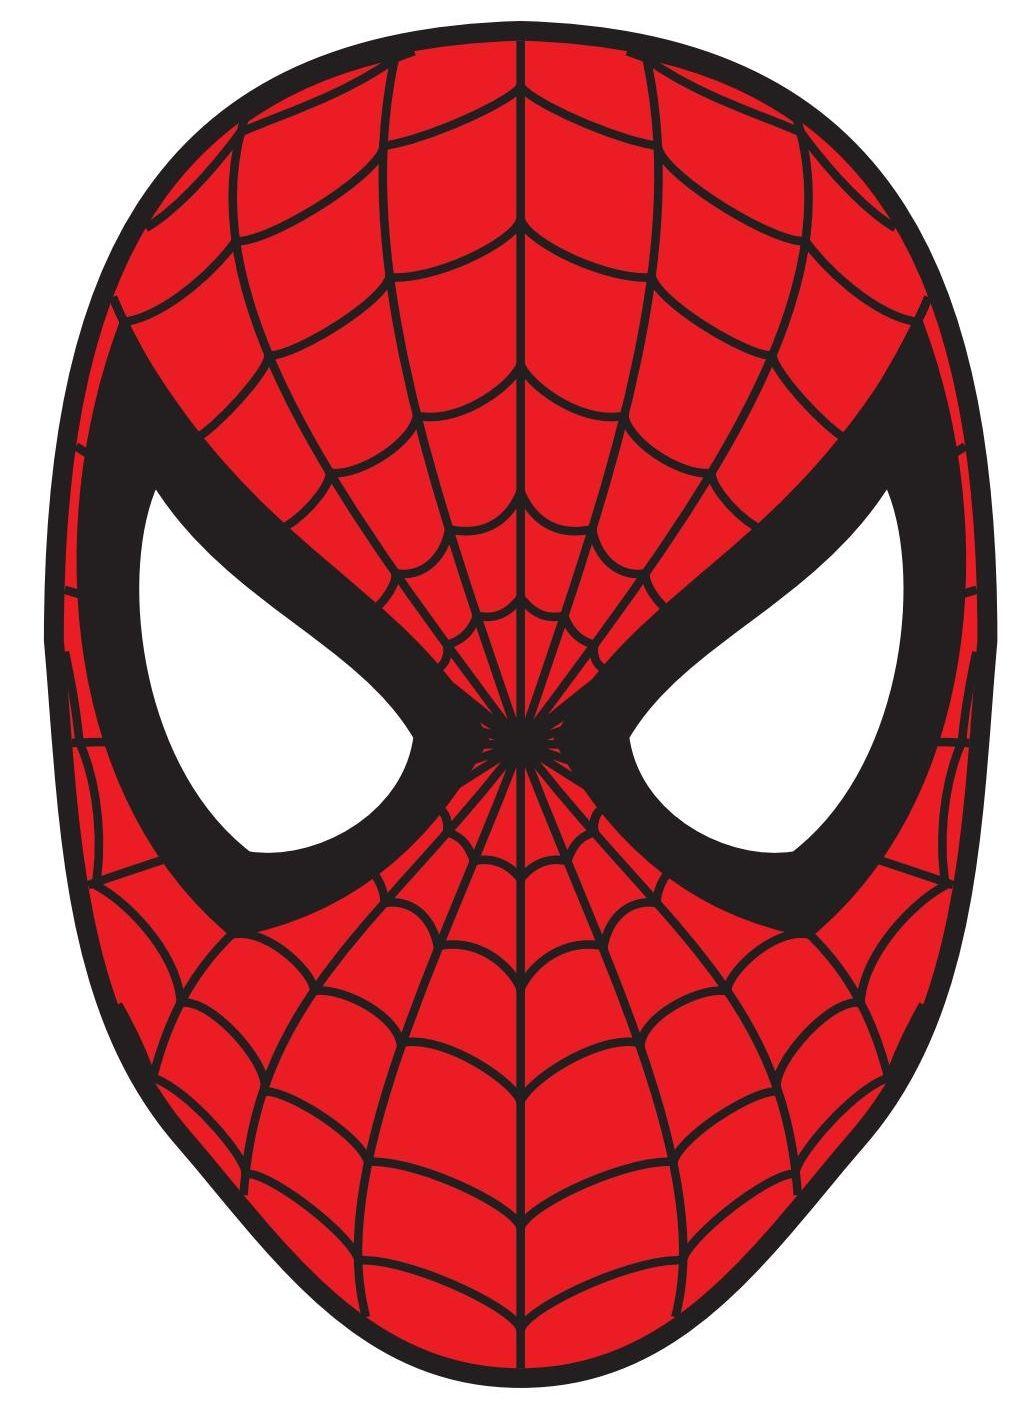 Man Logo Spider Birthday Batman Party Svg File Marvel Heroes